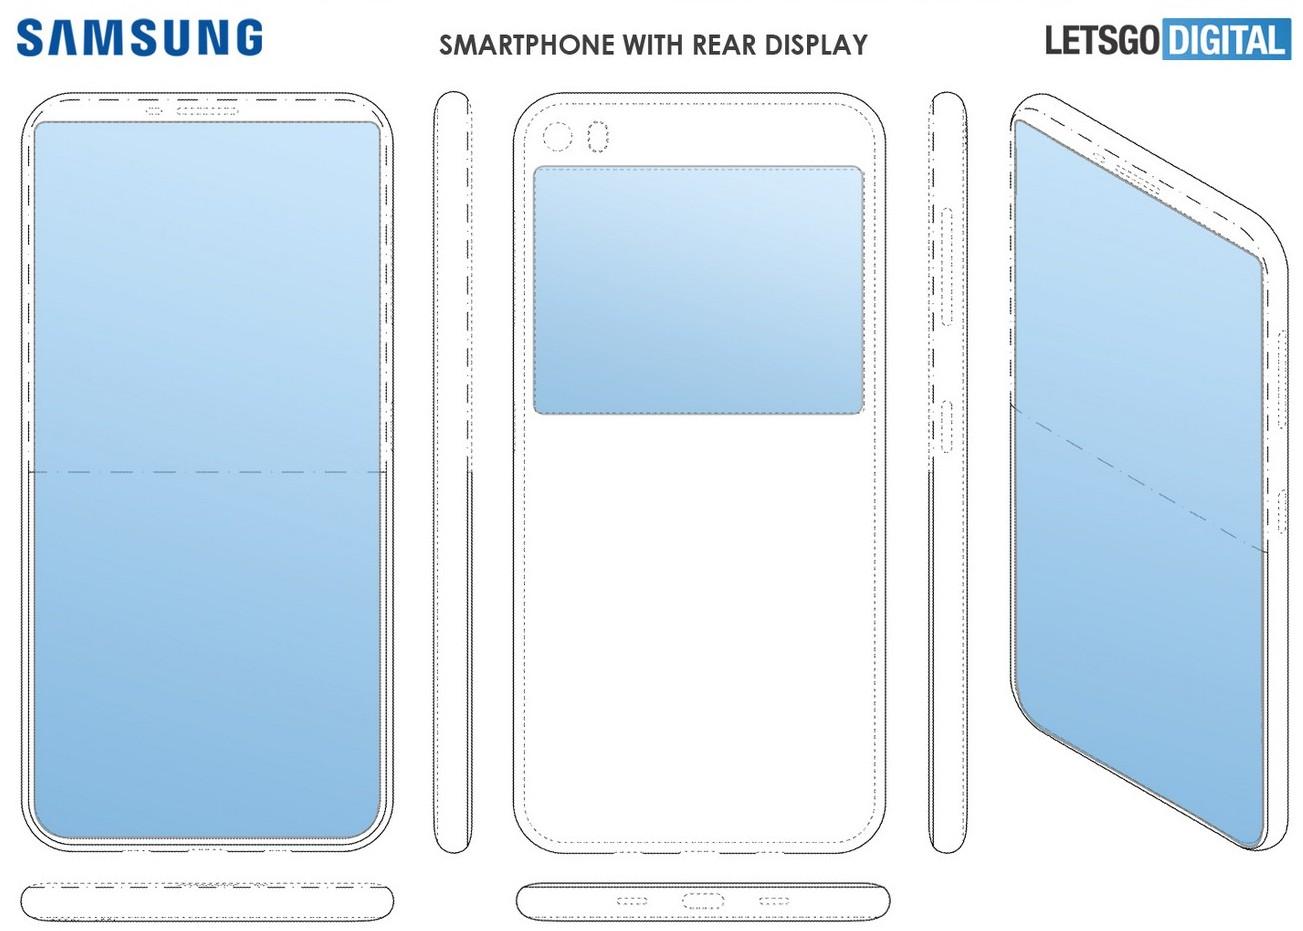 Samsung-Galaxy-A-Smartphone-Serie-bald-mit-Dual-Display-